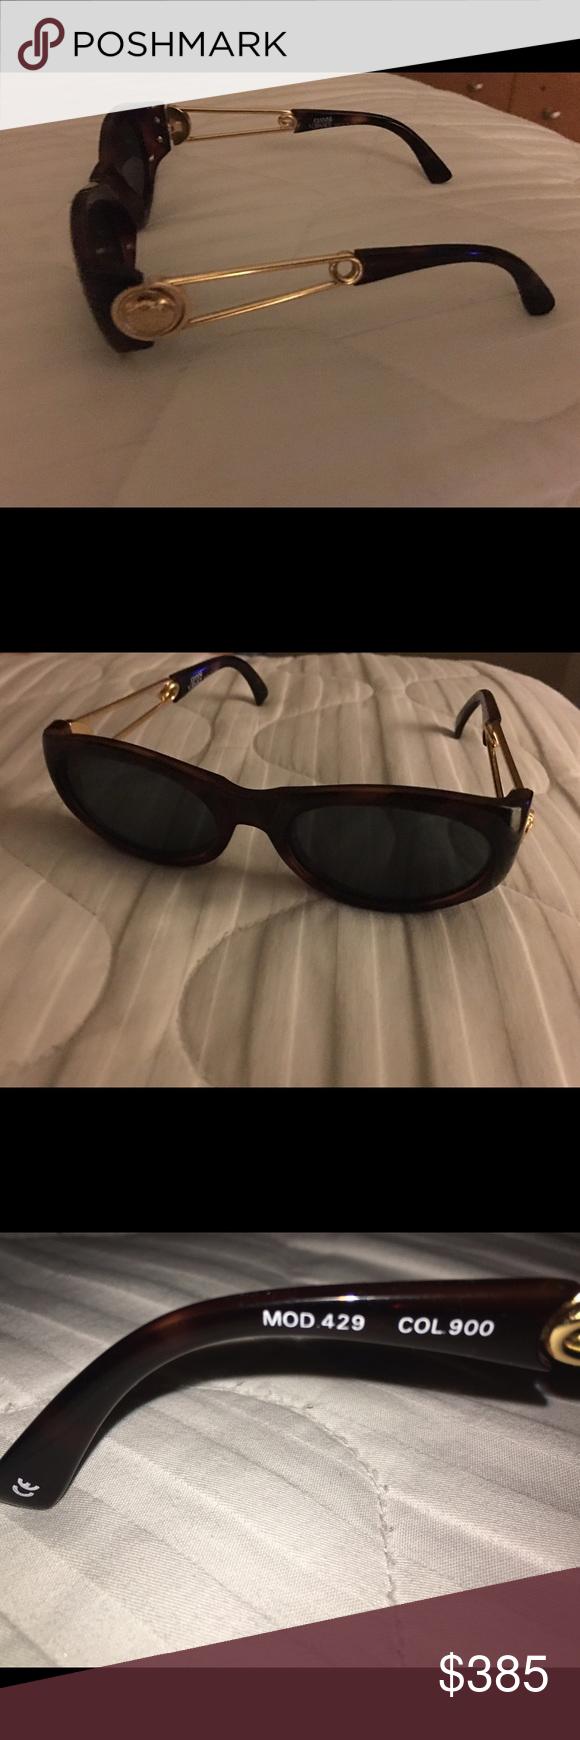 857b6b5a2e Gianni Versace Vintage sunglasses. Rare Vintage  Gianni Versace  Sunglasses  - Mod 429 Col